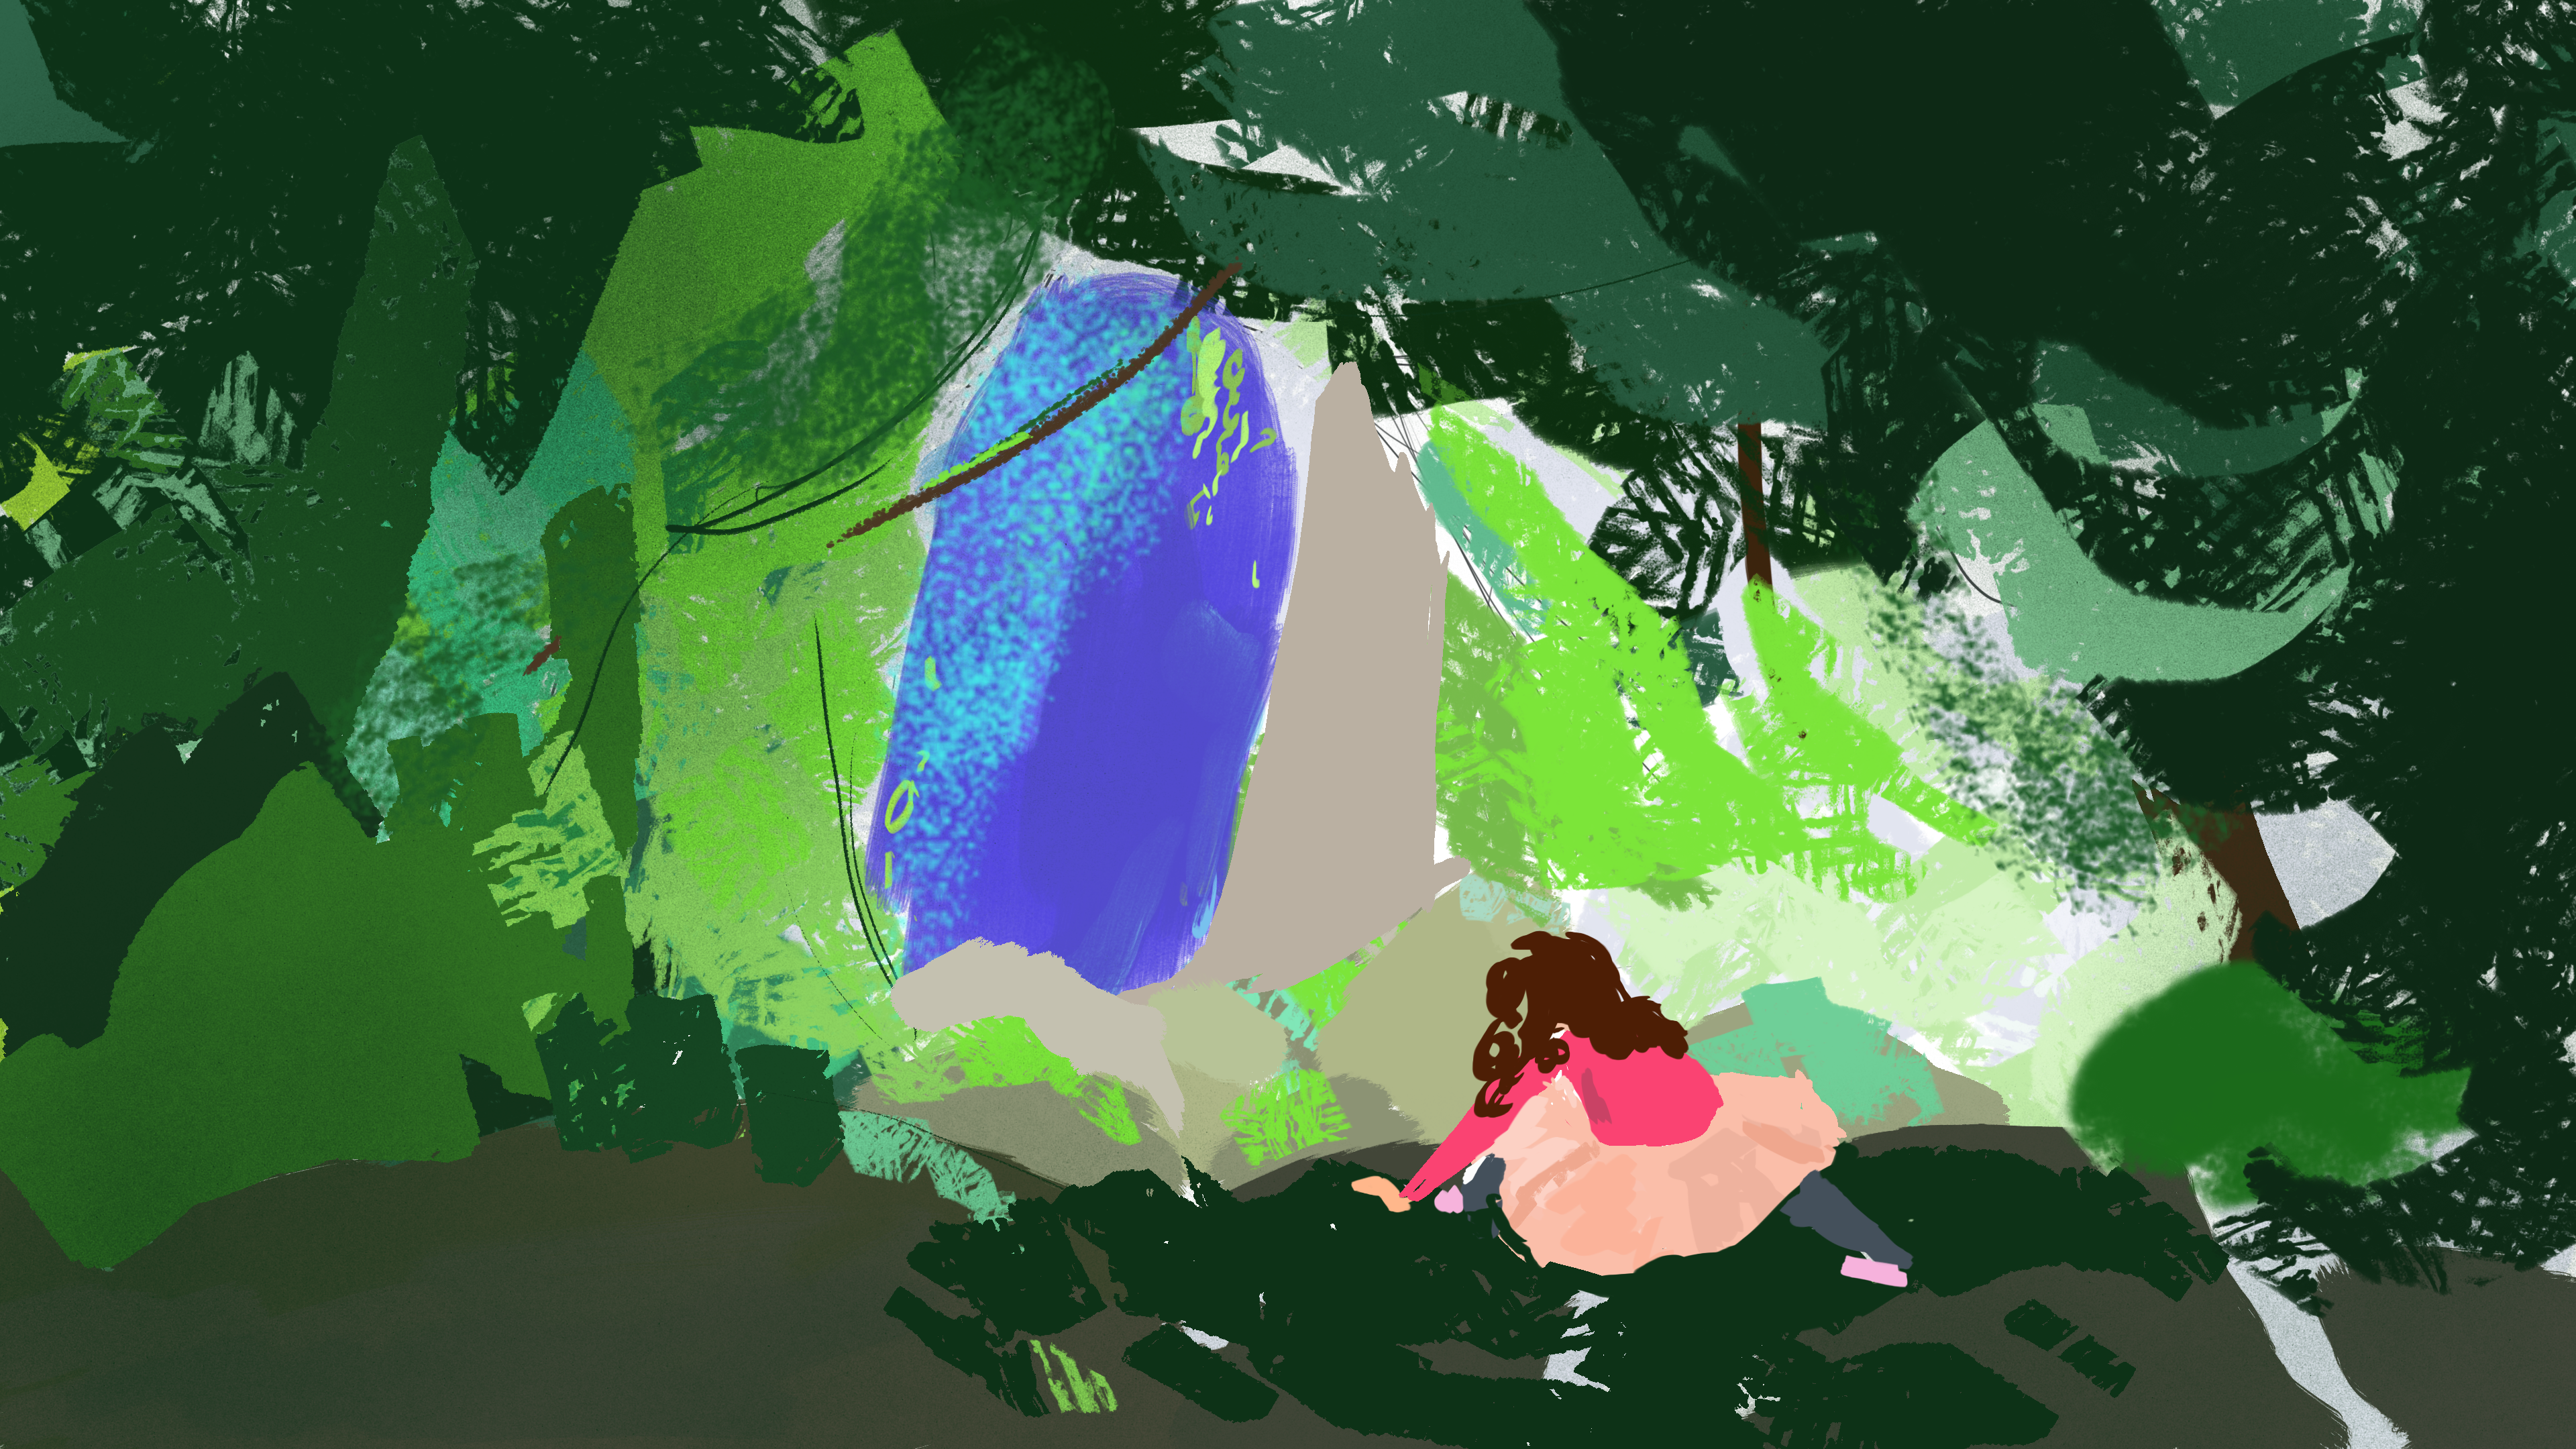 forest climb (color sketch)